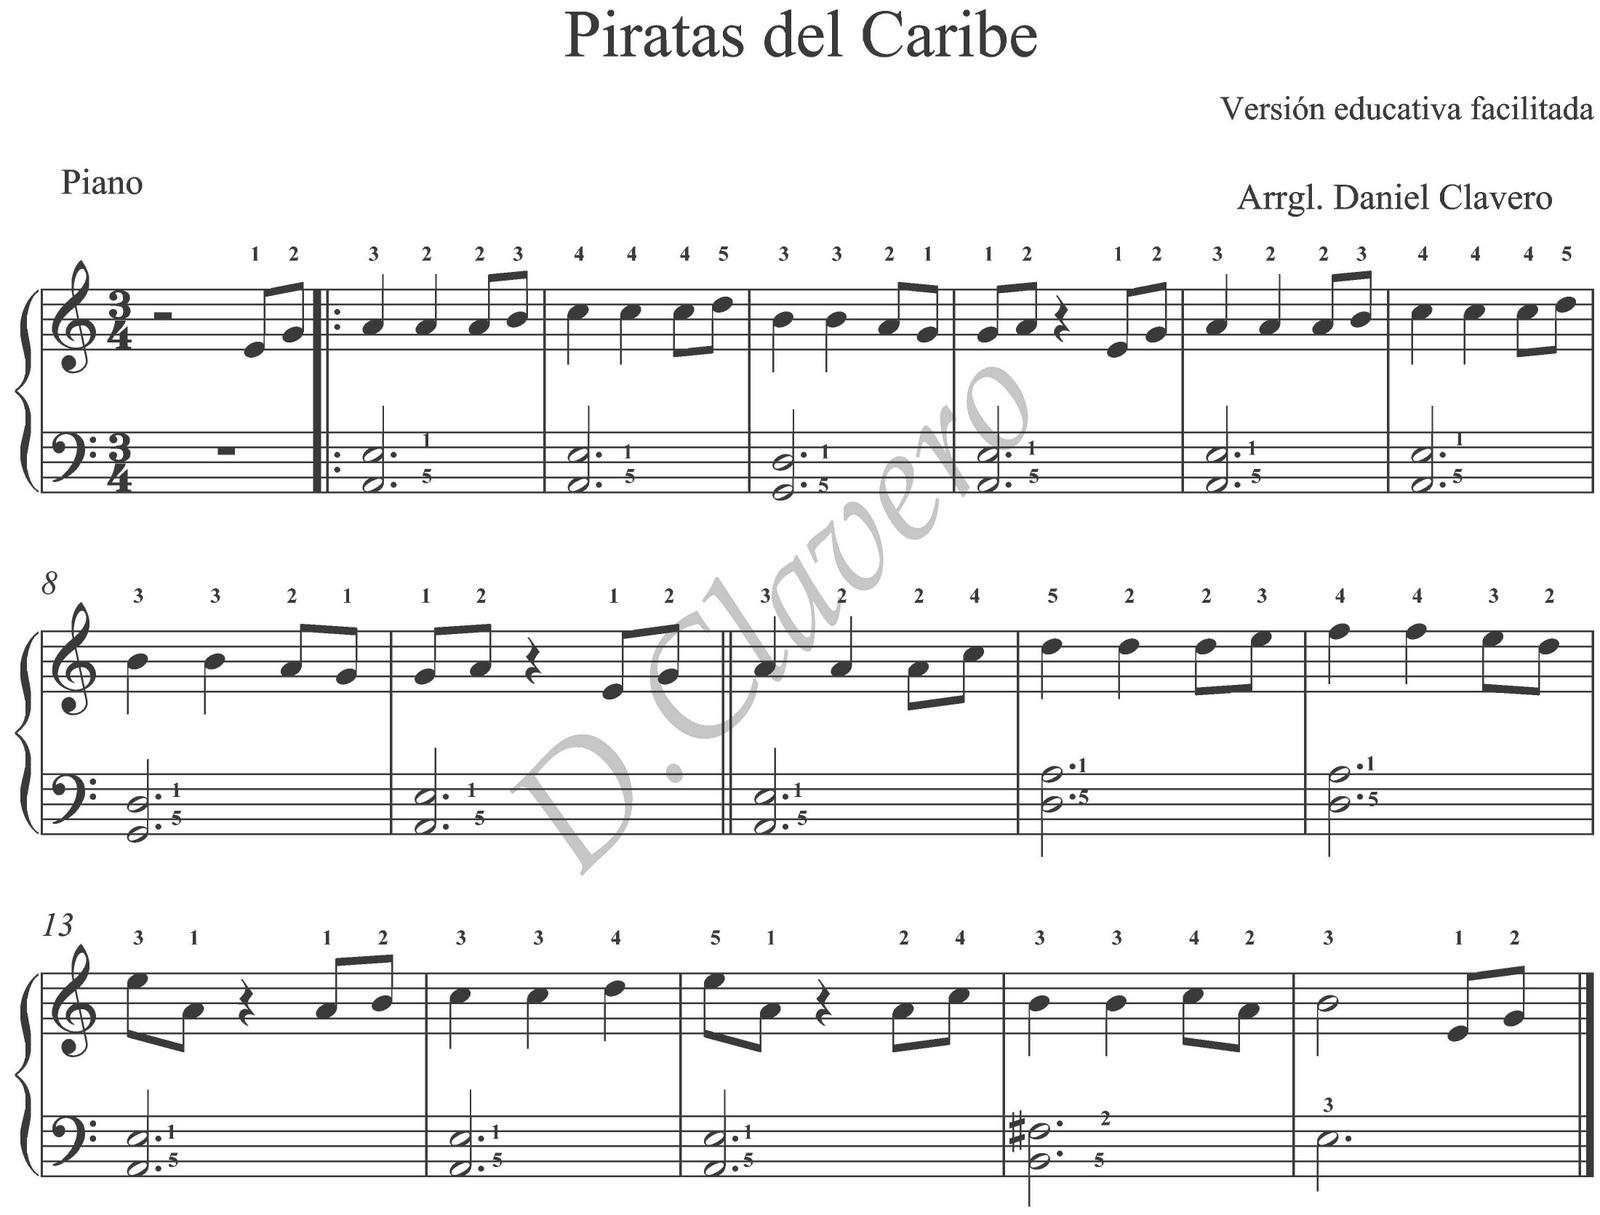 Partitura Piratas Del Caribe Piano Pdf Unifeed Club